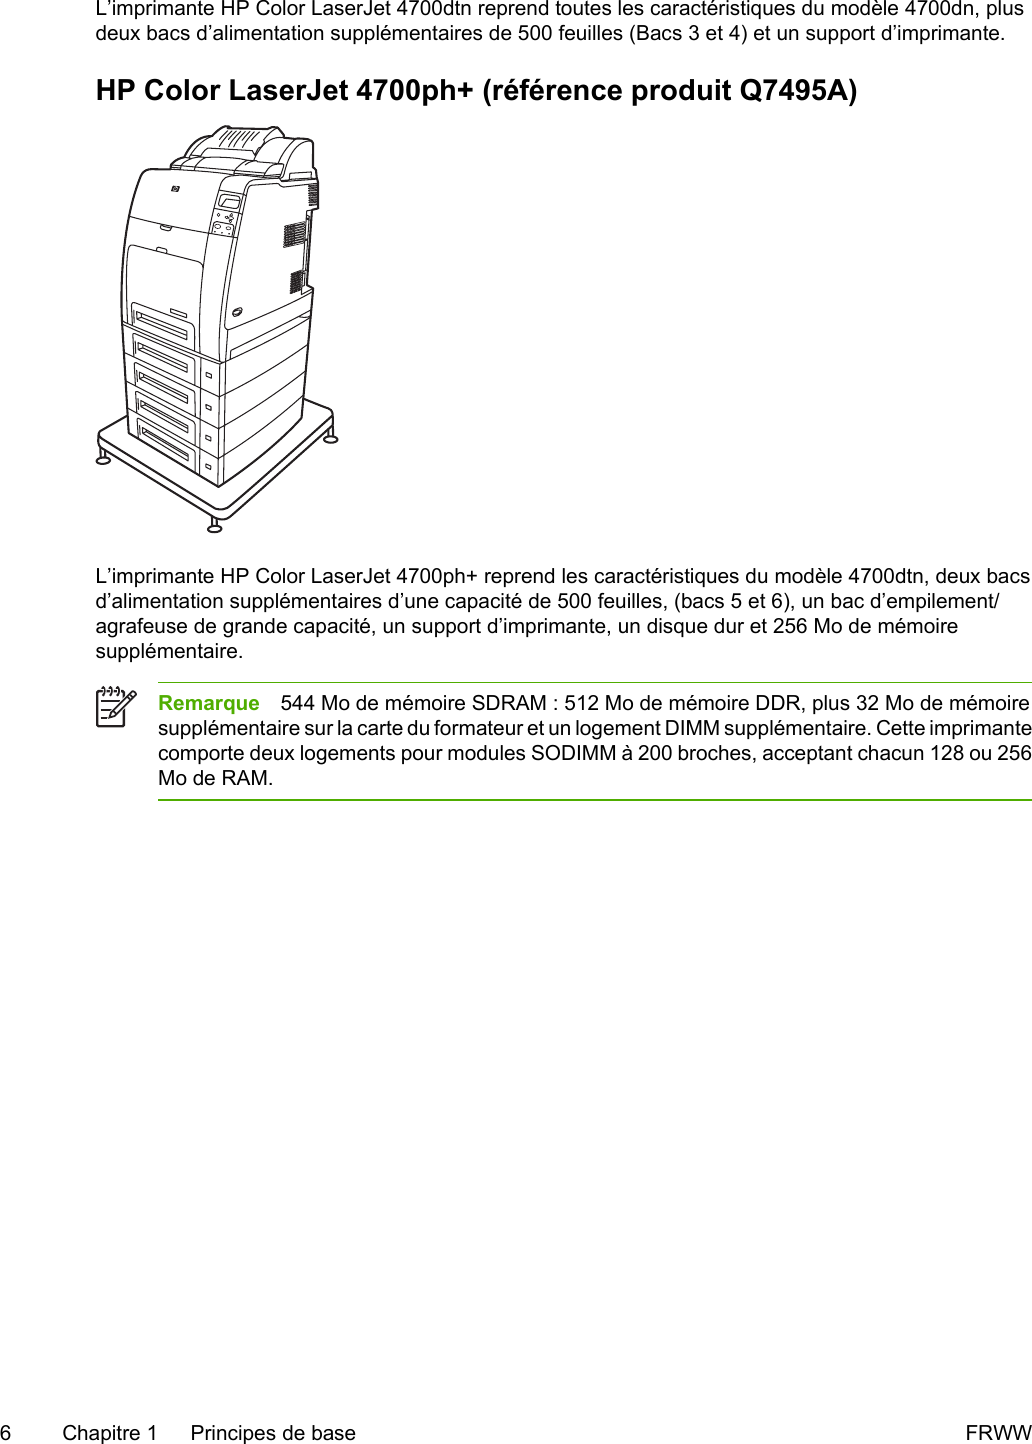 Güde Batterie Agrafeuse Ions Agrafeuse avec Agrafeuse pied de support parenthèse périphérique Agrafeuse périphérique